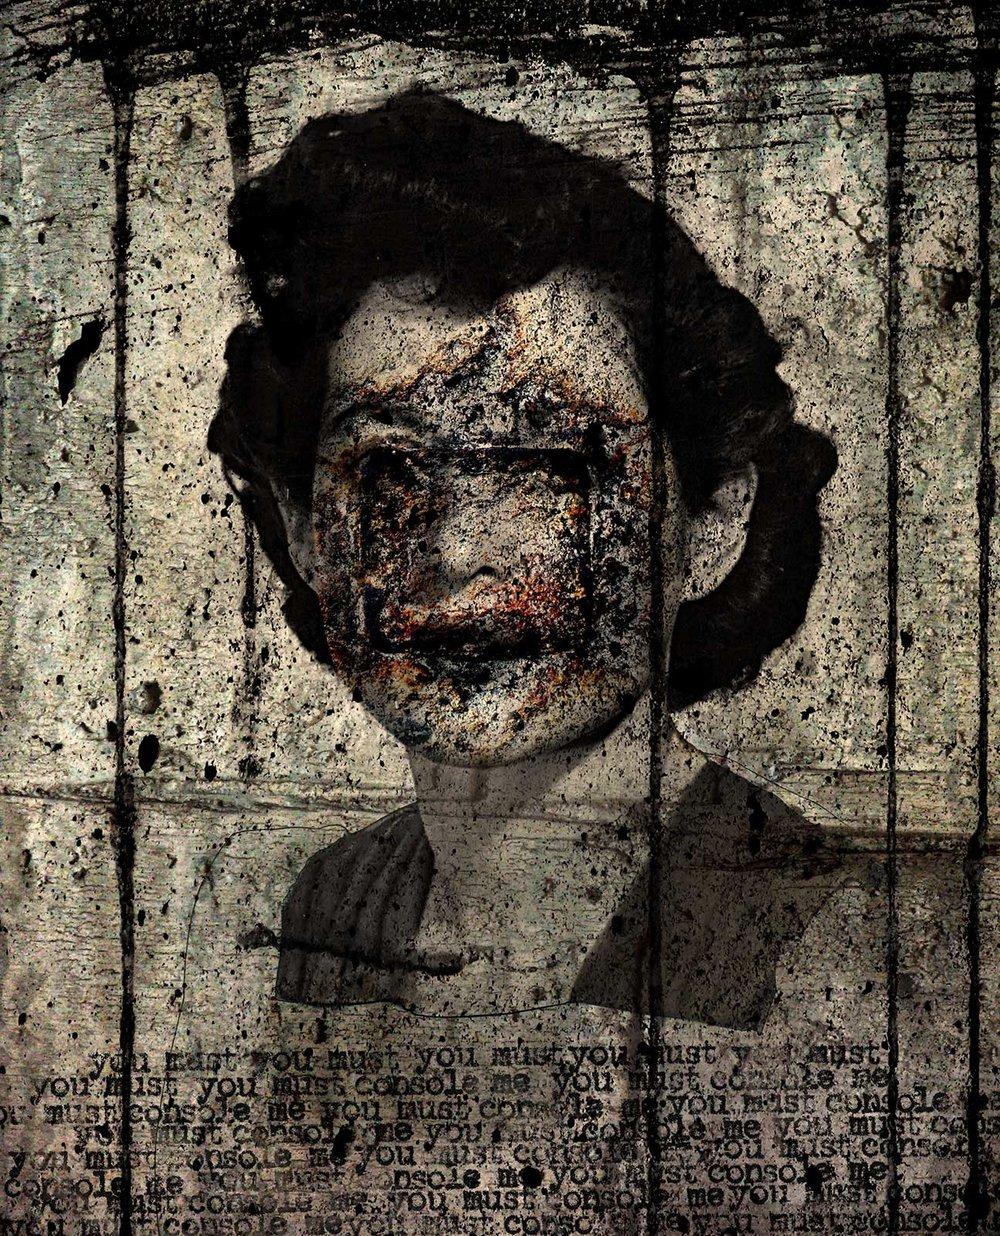 Frances (you must console me)  2012 Archival pigment print 100 H x 81 W cm / 39 ¼ x 31 ¾ in